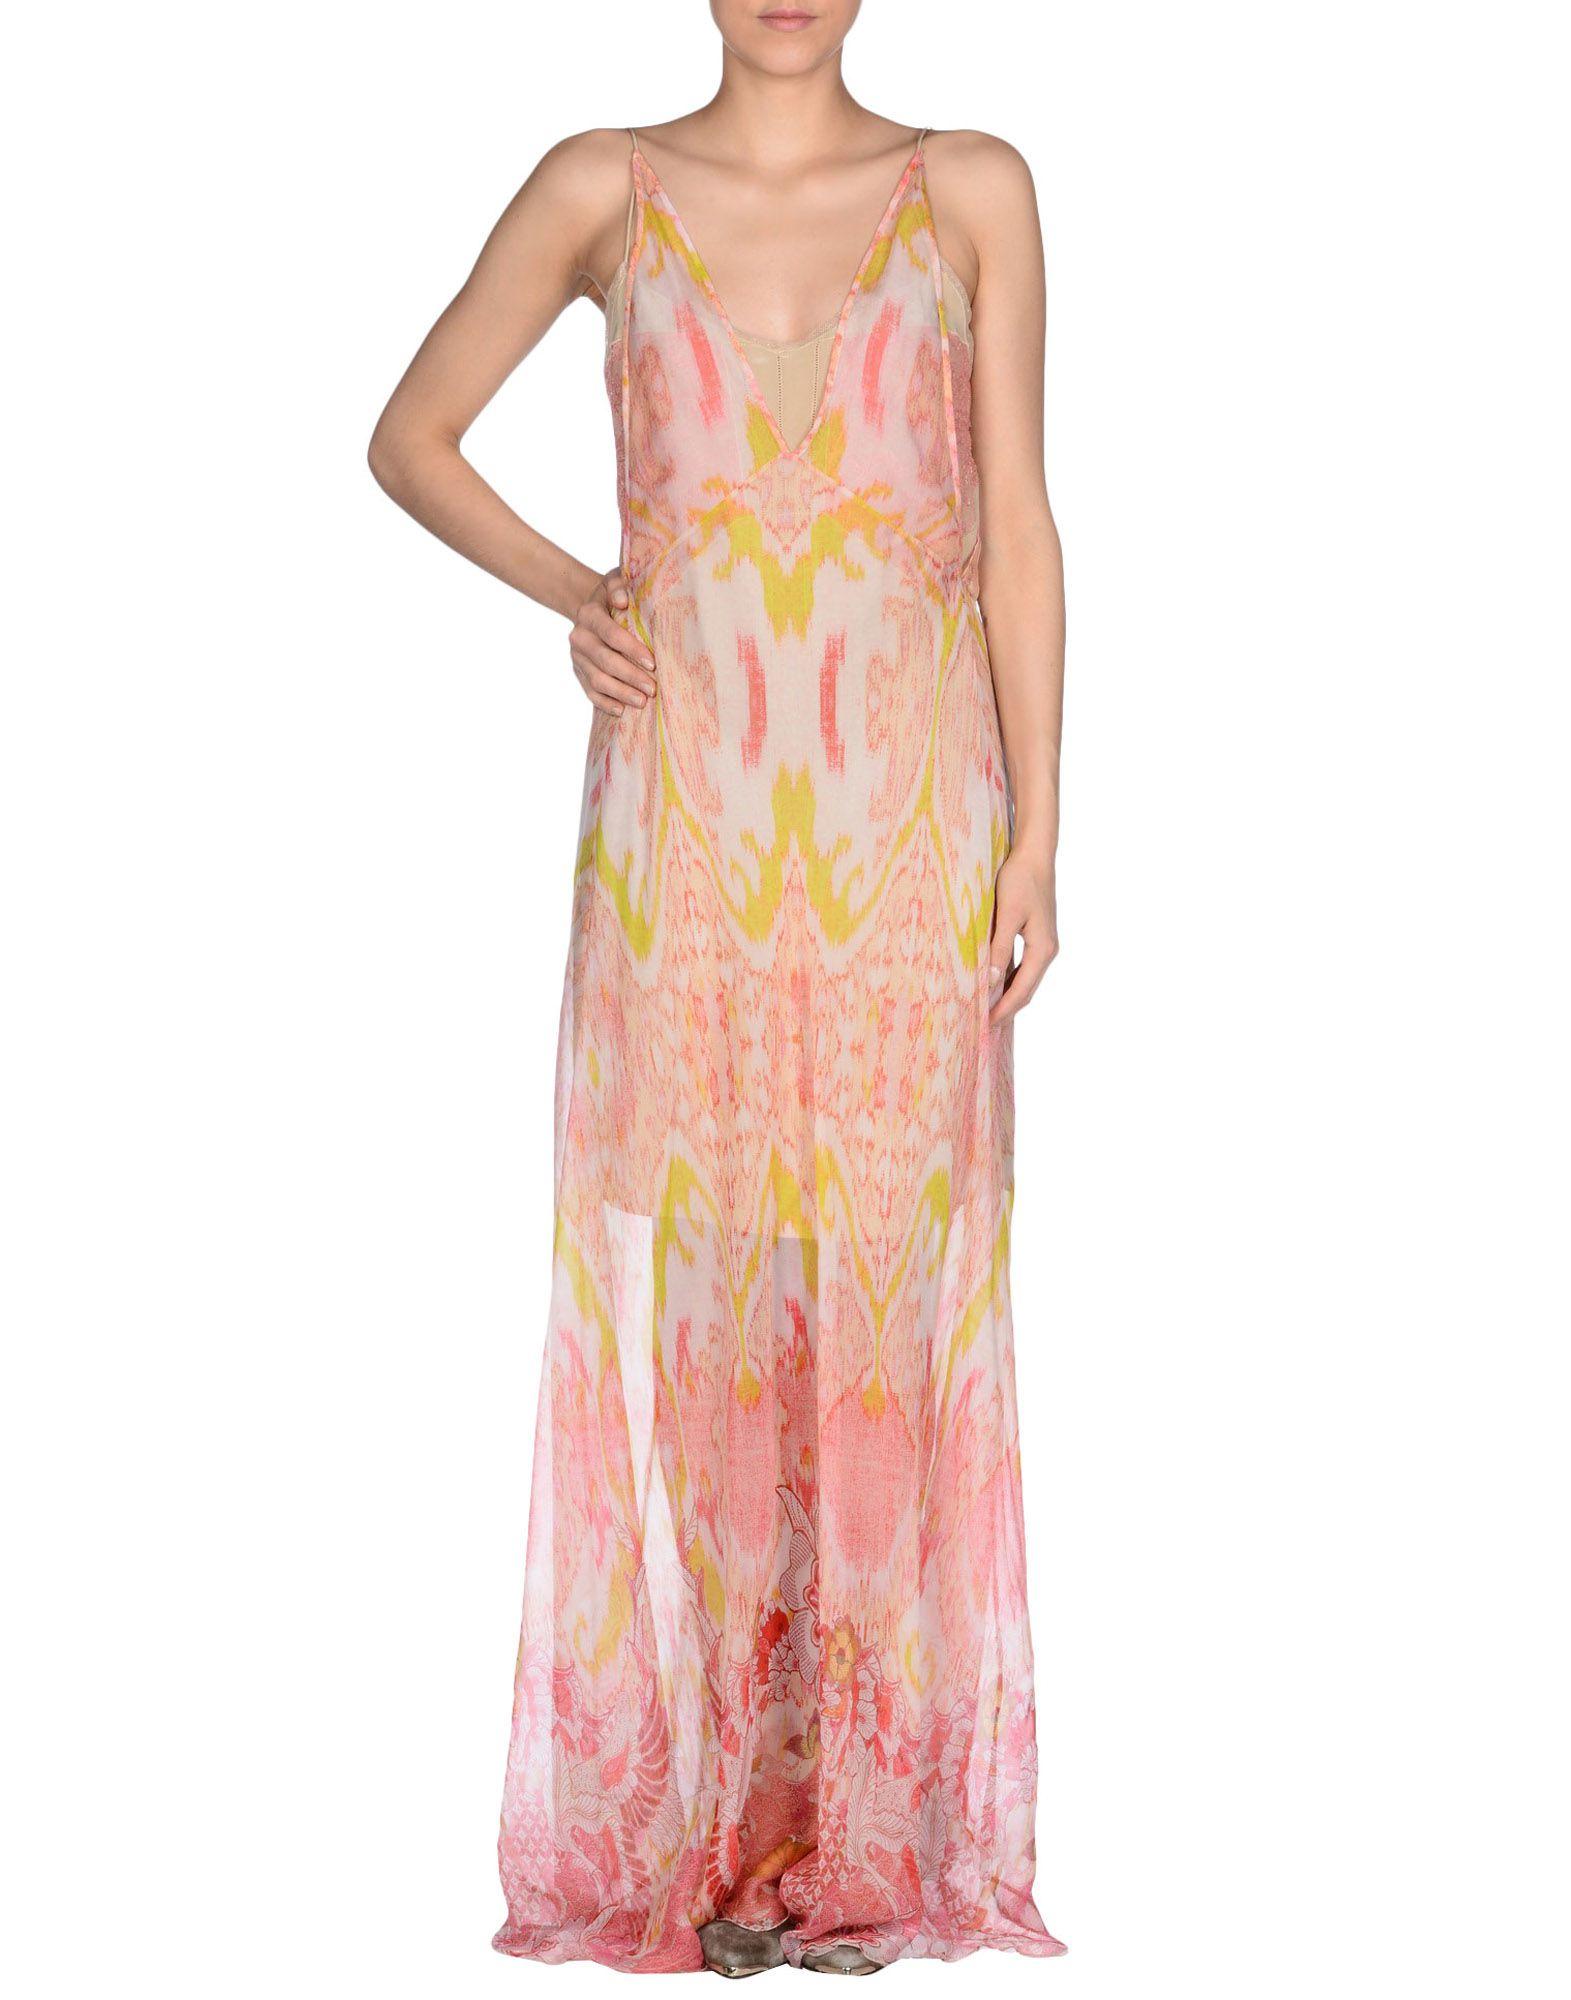 ROBERTO CAVALLI レディース DRESSES 送料無料 Turquoise Long dress